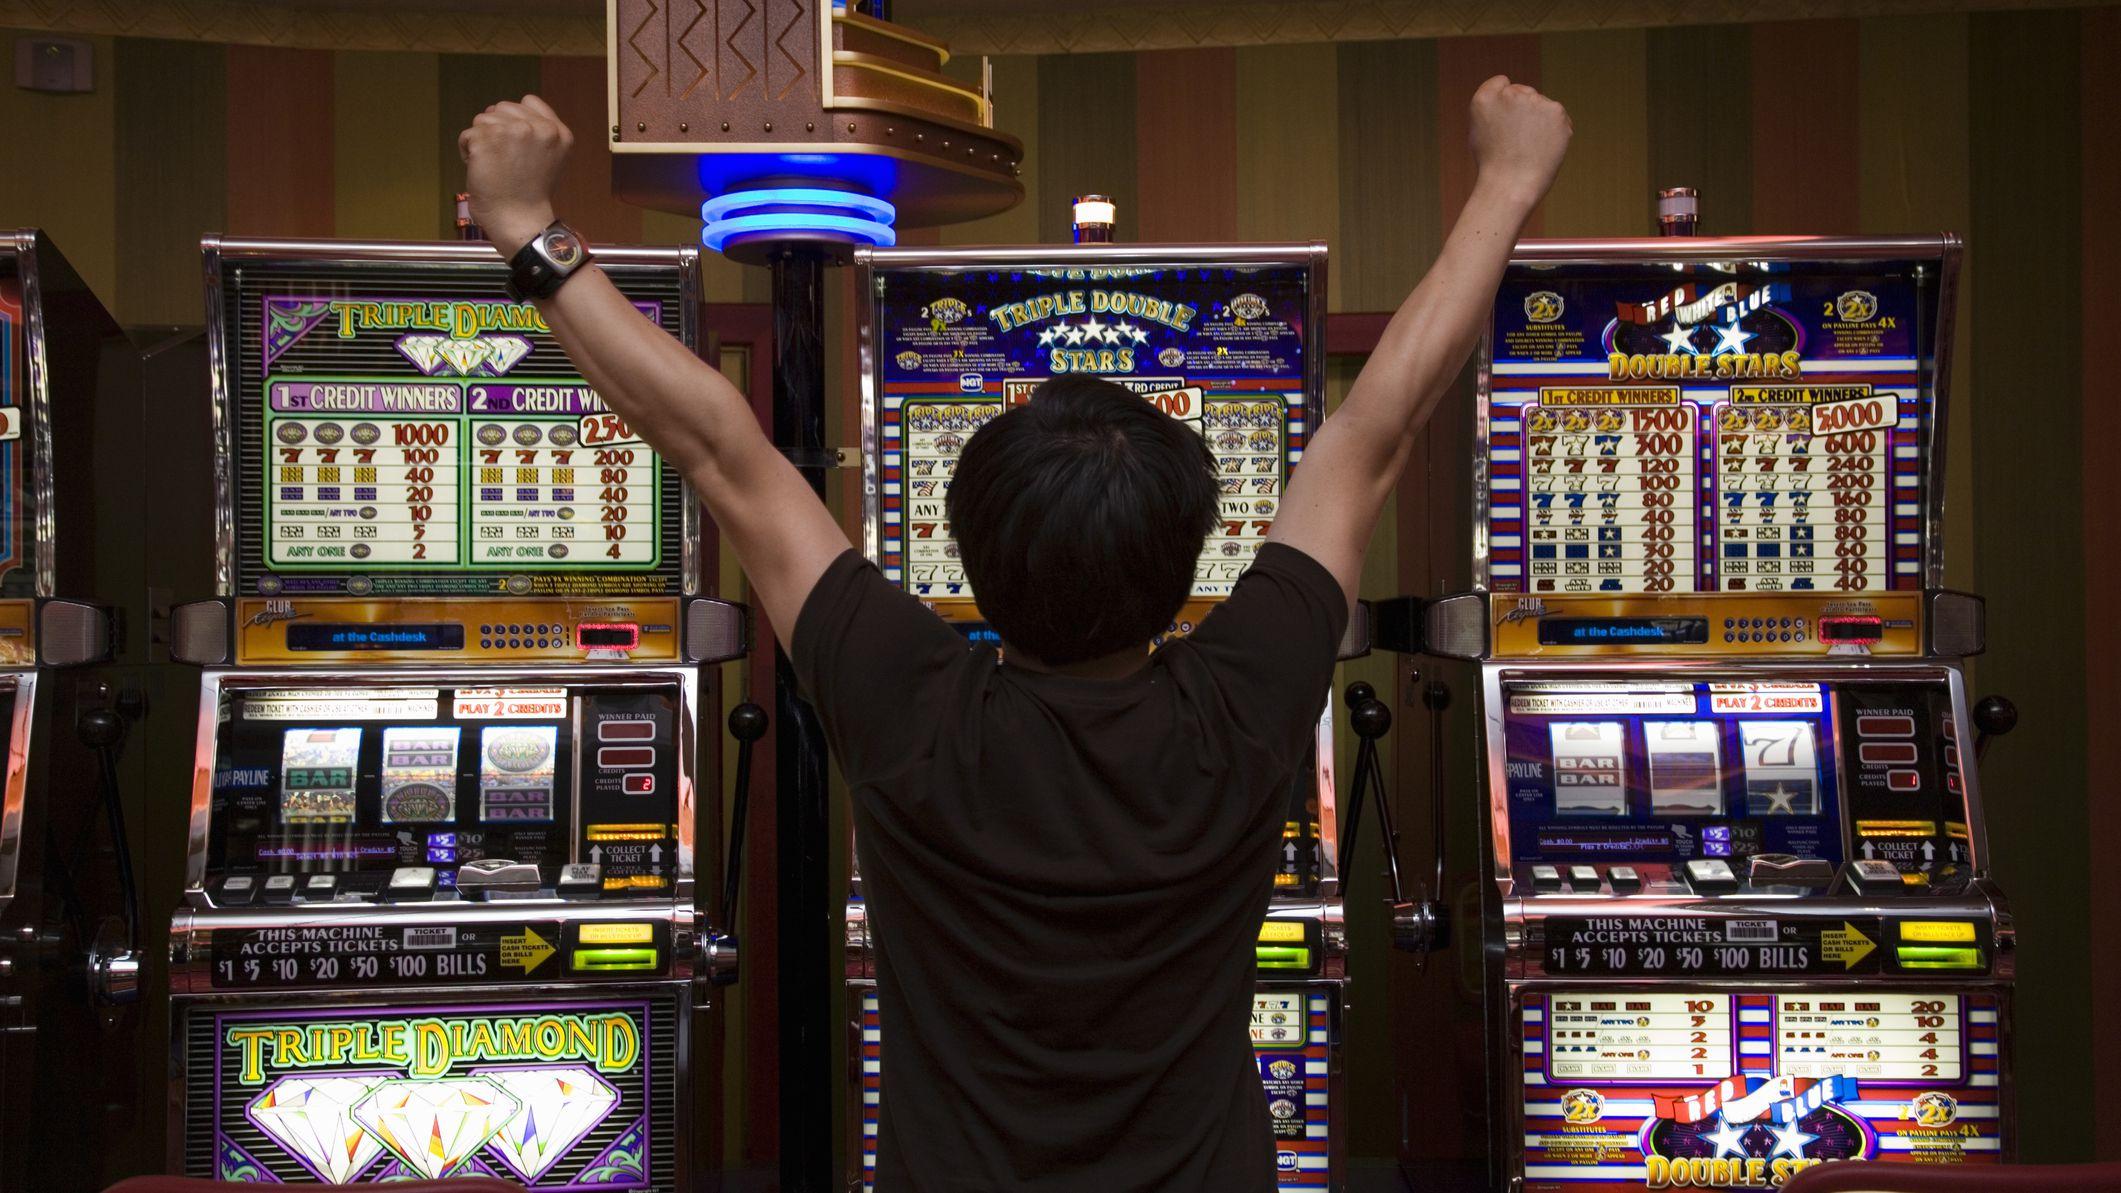 Casino Hall image